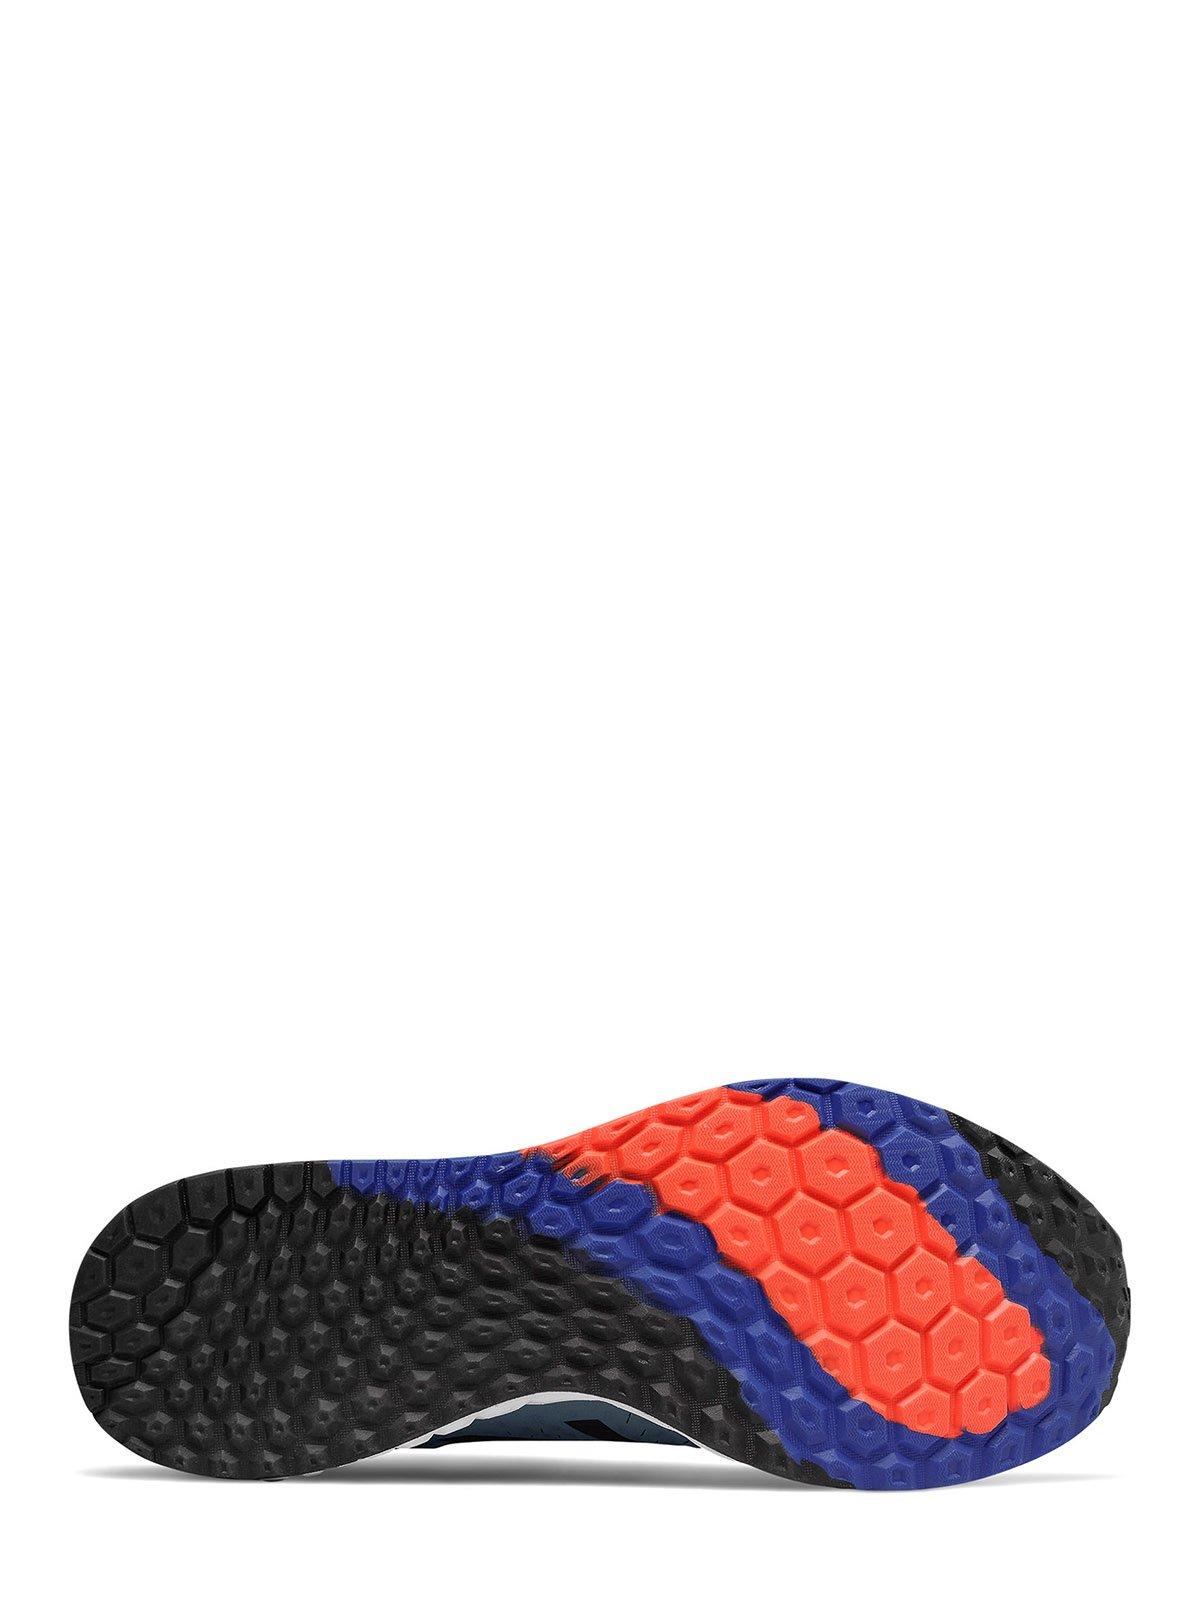 Кросівки блакитні Fresh Foam Zante v4 | 4042483 | фото 4